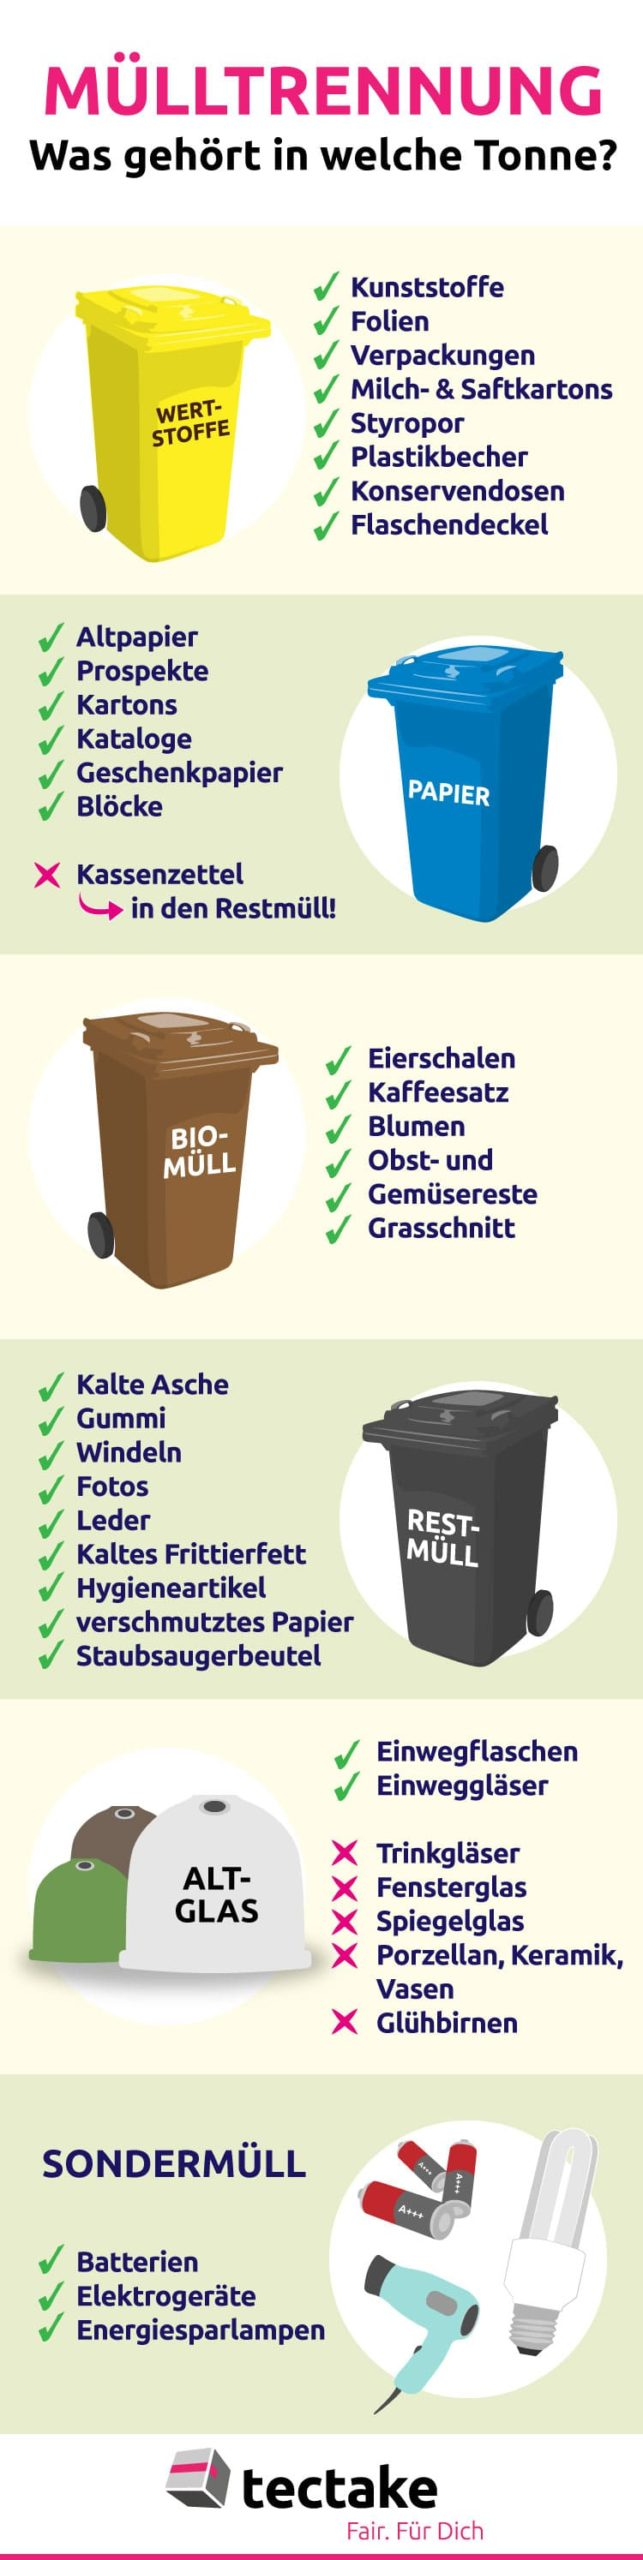 Mülltrennung ® tectake